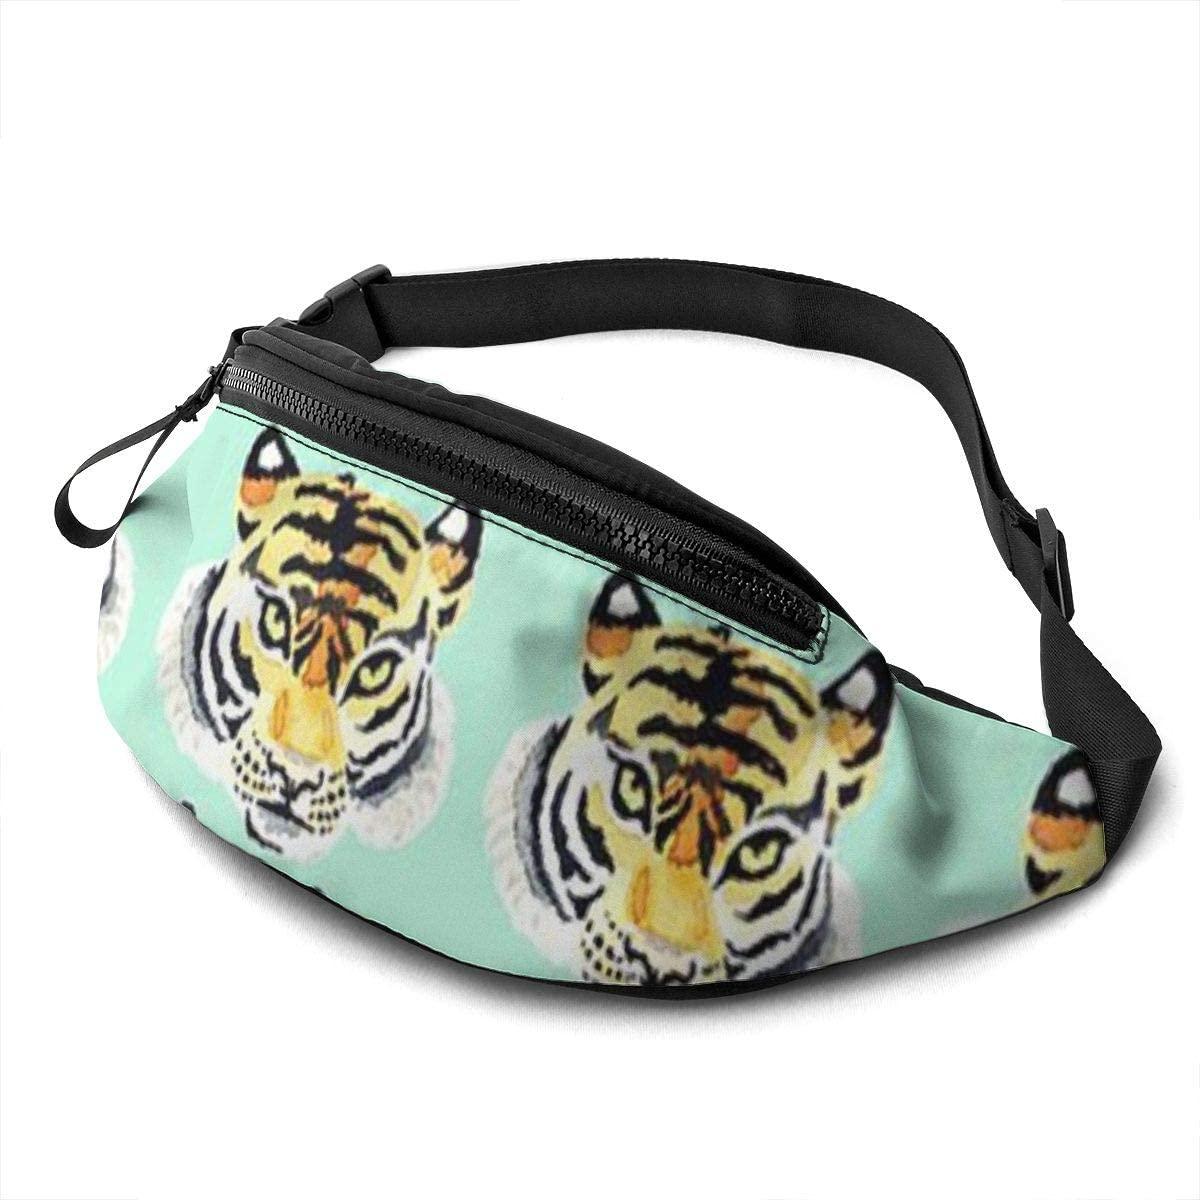 Tiger Pattern Fanny Pack For Men Women Waist Pack Bag With Headphone Jack And Zipper Pockets Adjustable Straps